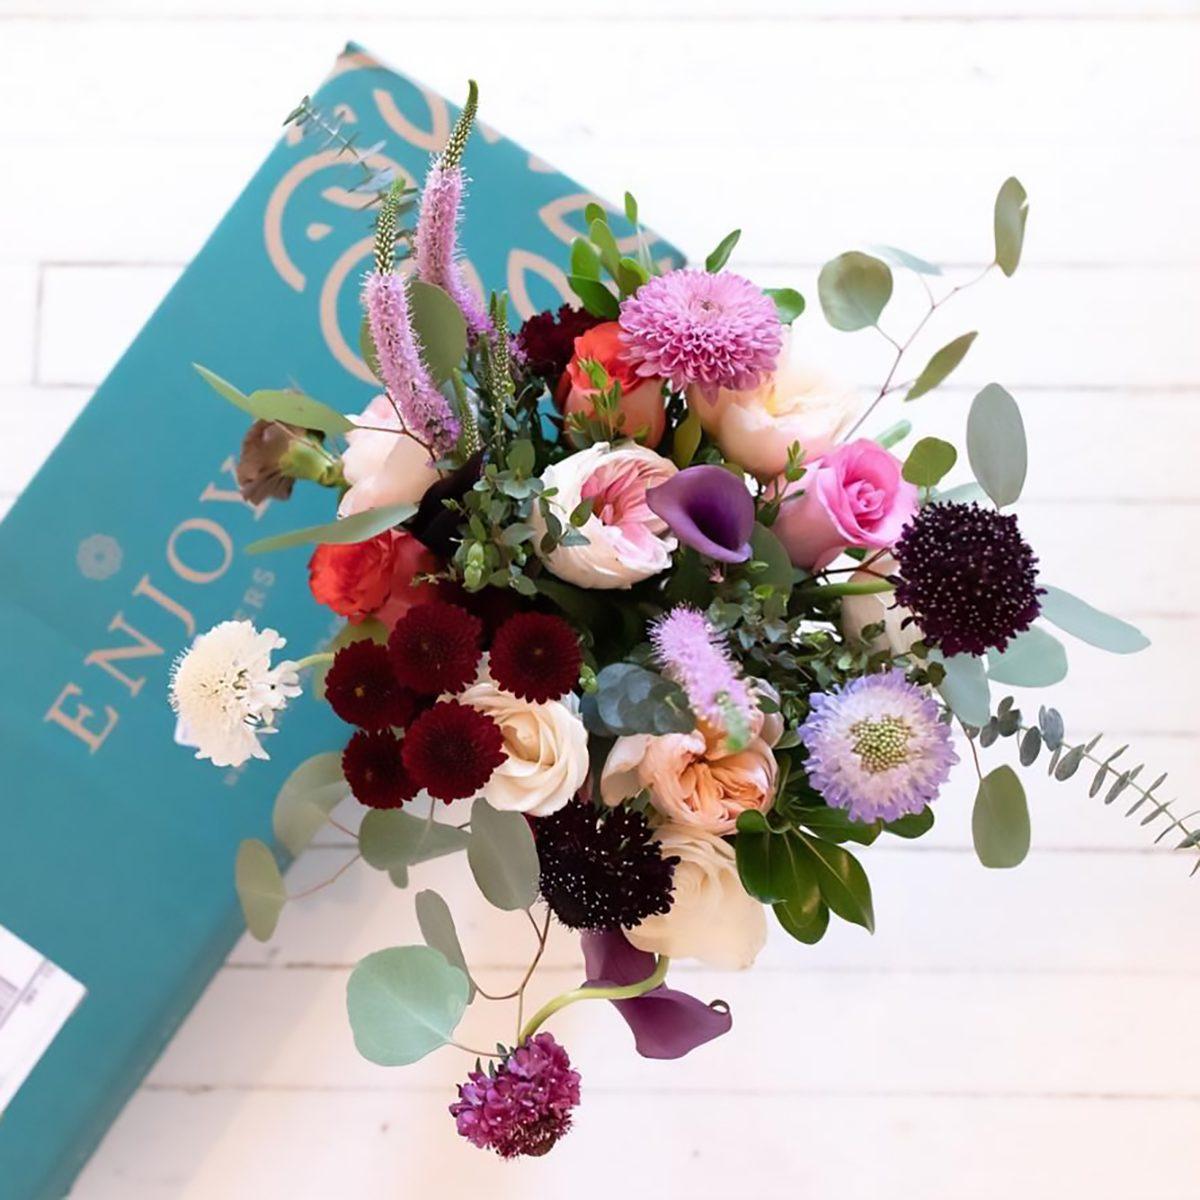 Enjoy Flowers bouquet